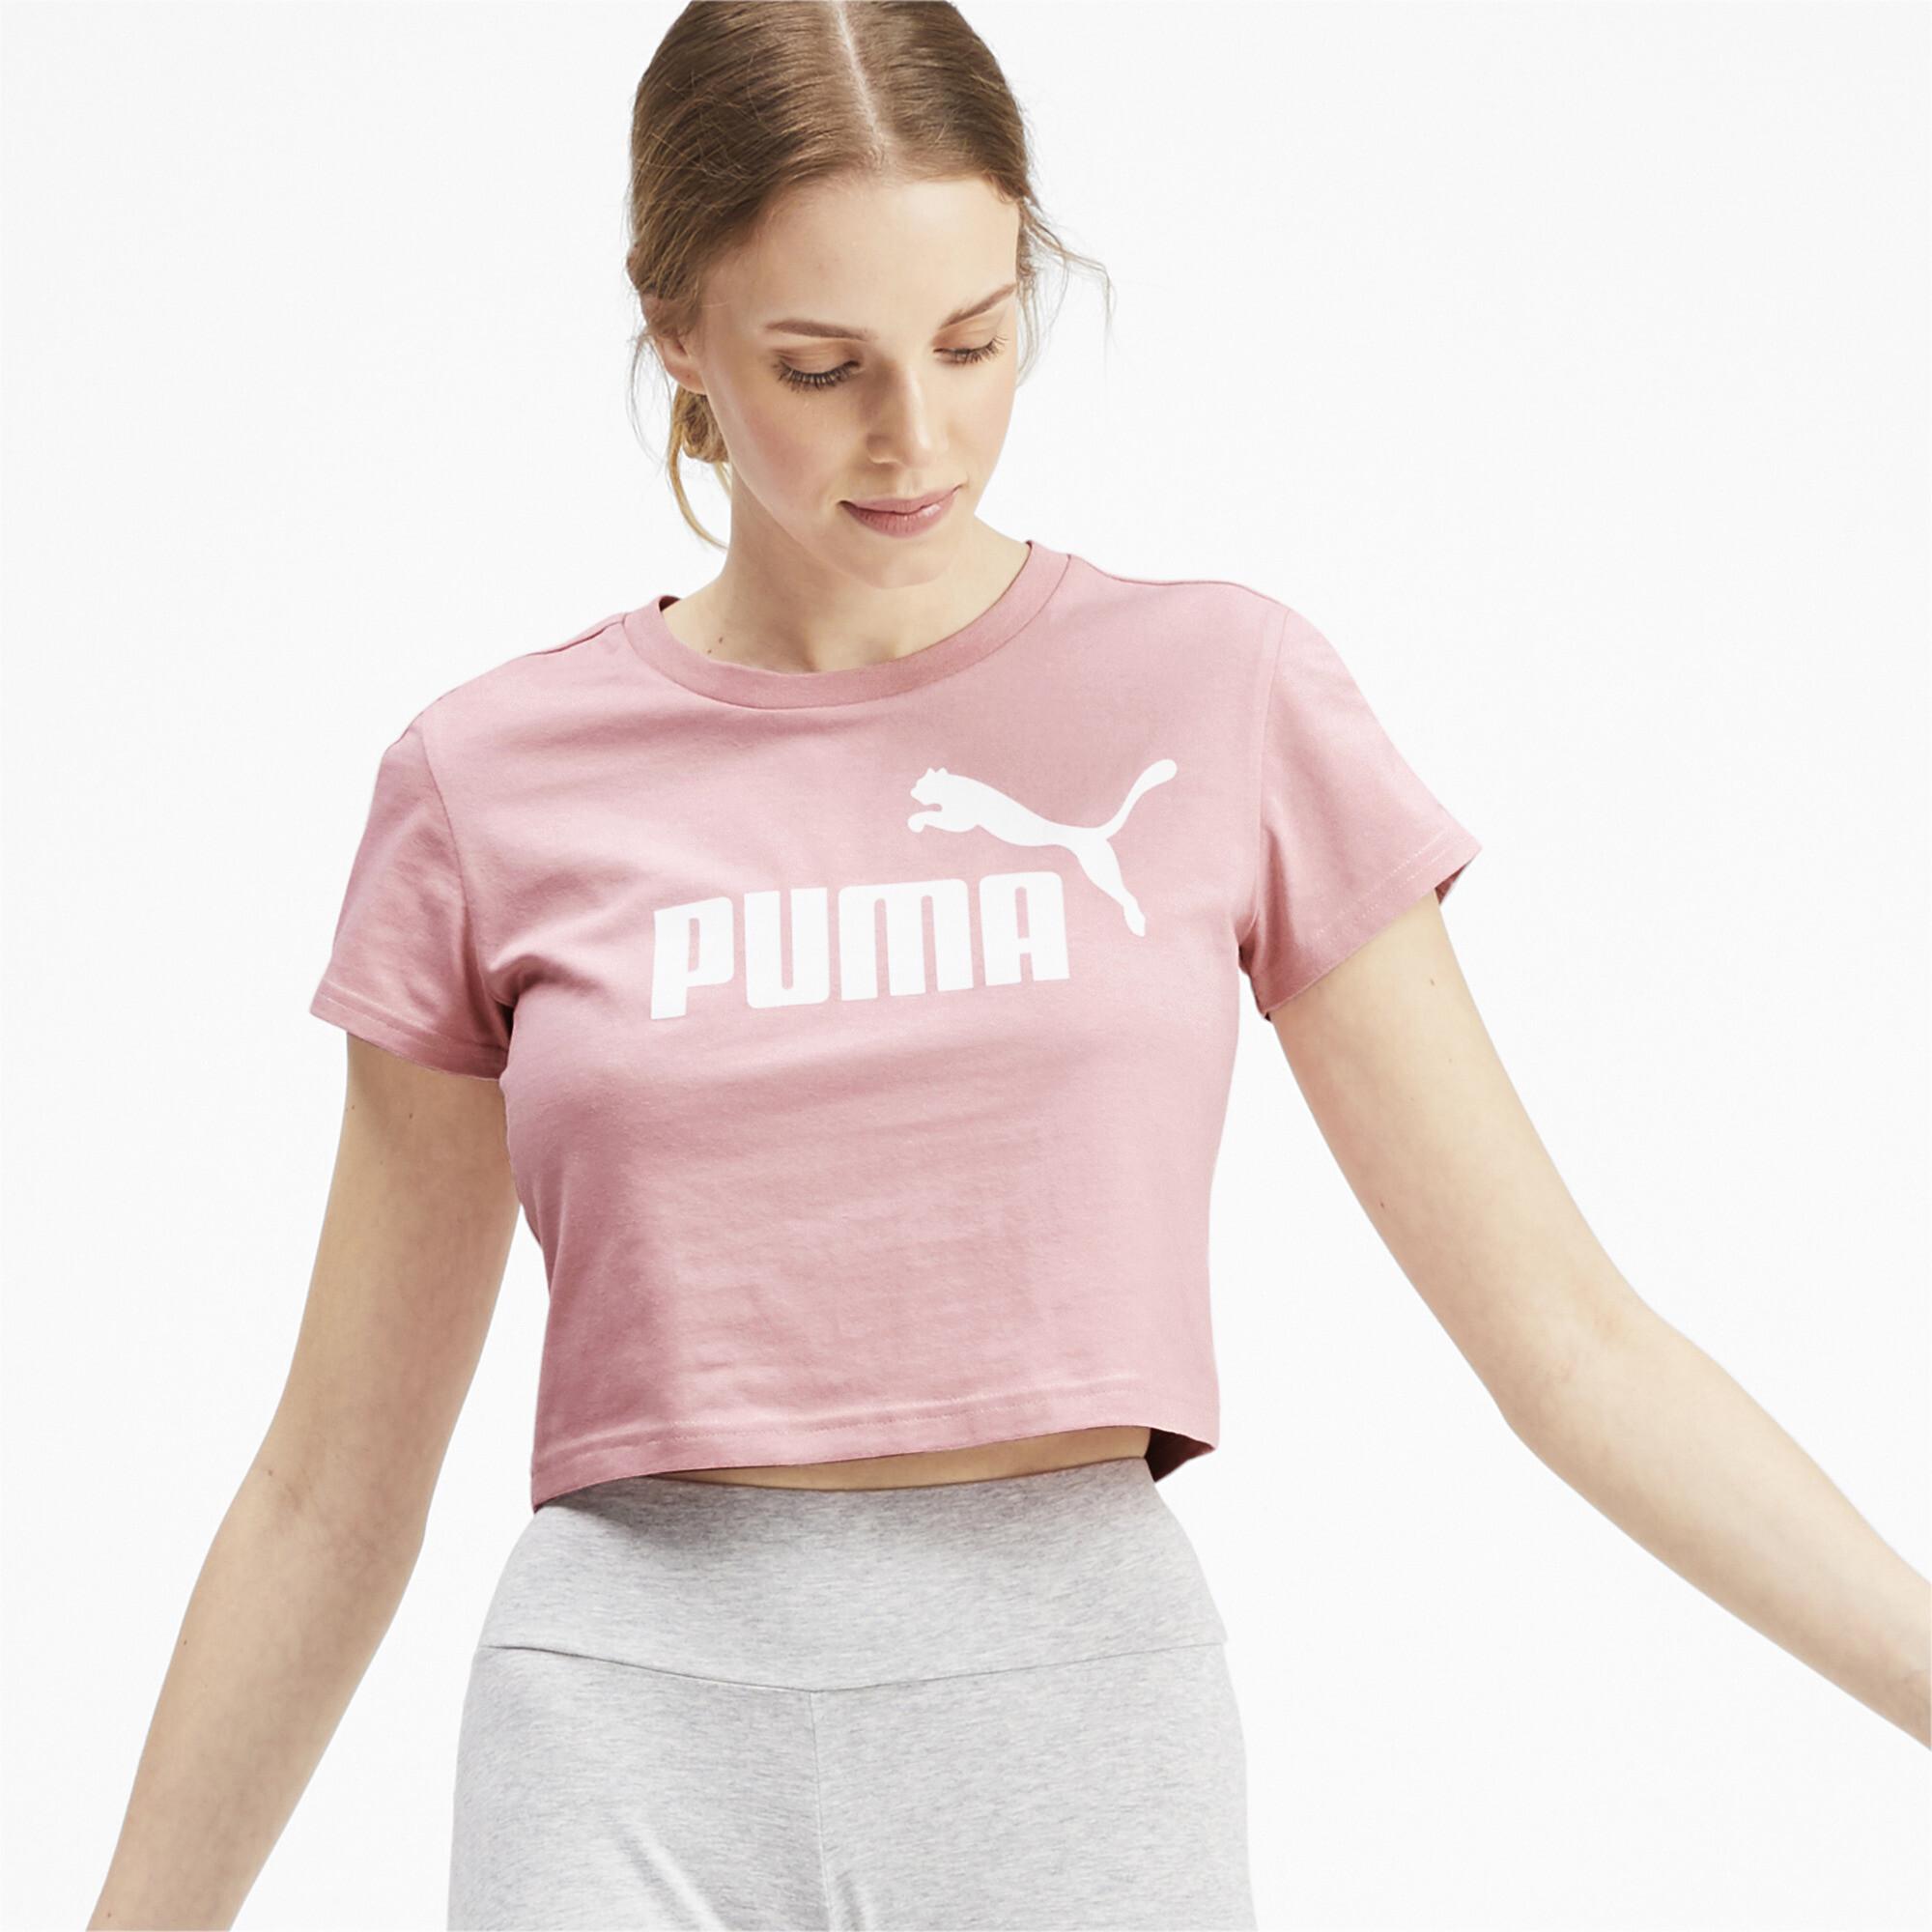 PUMA-Amplified-Women-039-s-Fitted-Logo-Tee-Women-Tee-Basics thumbnail 4